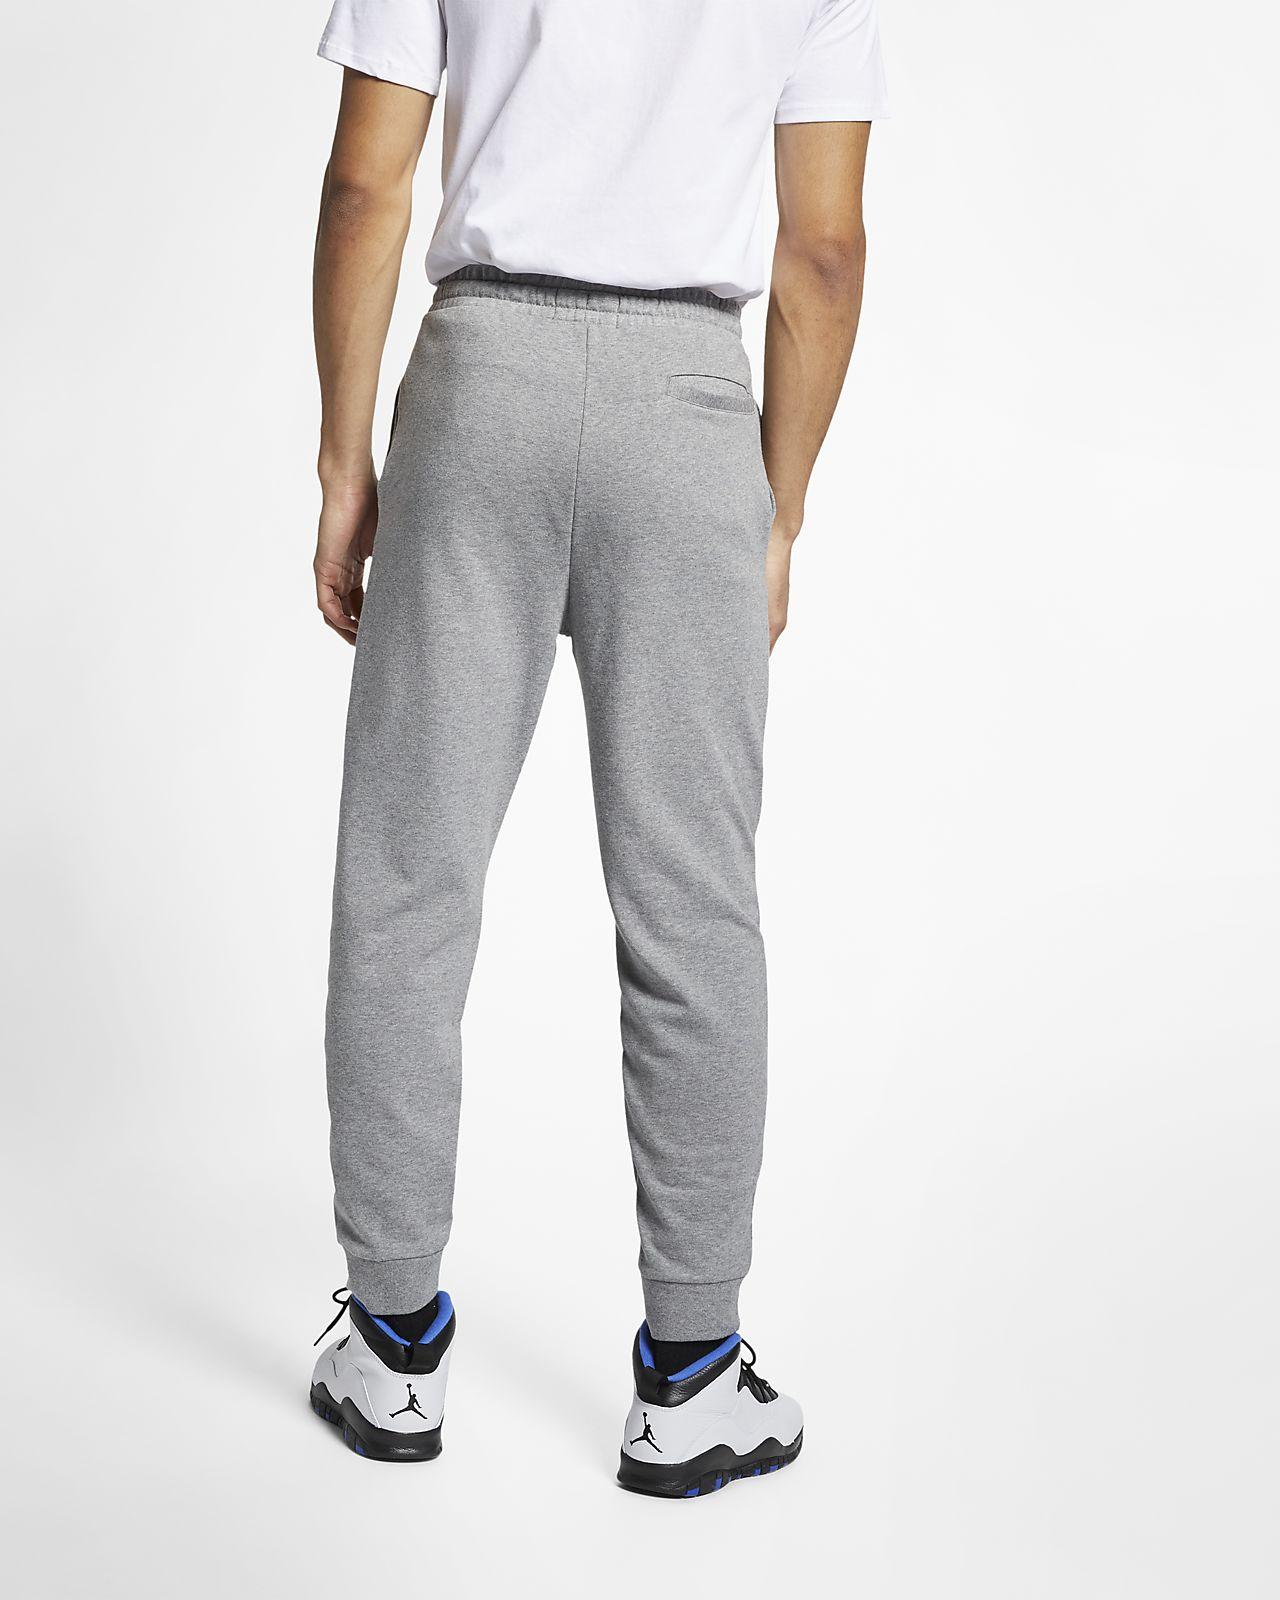 b4c994297ea3 Jordan Jumpman Air Men s Lightweight Fleece Trousers. Nike.com CA